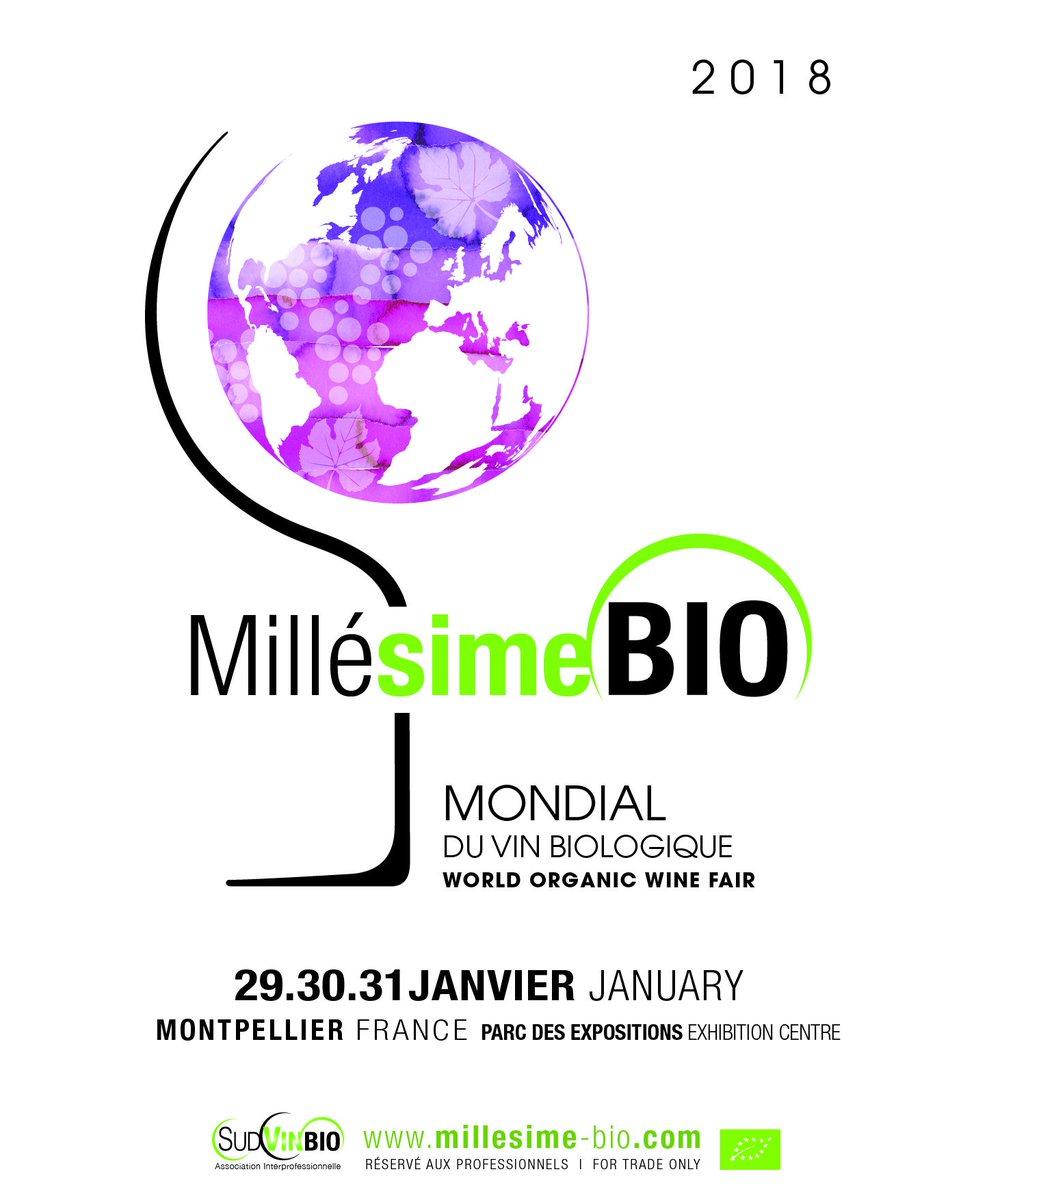 #MillésimeBio 2018 2018/01/29-31 in #Montpellier. Stand bookings from next June on @garatoni_luca @RealWineGuru @IlovefranceEU @Susan_PWZ<br>http://pic.twitter.com/YtVWGYnVBW